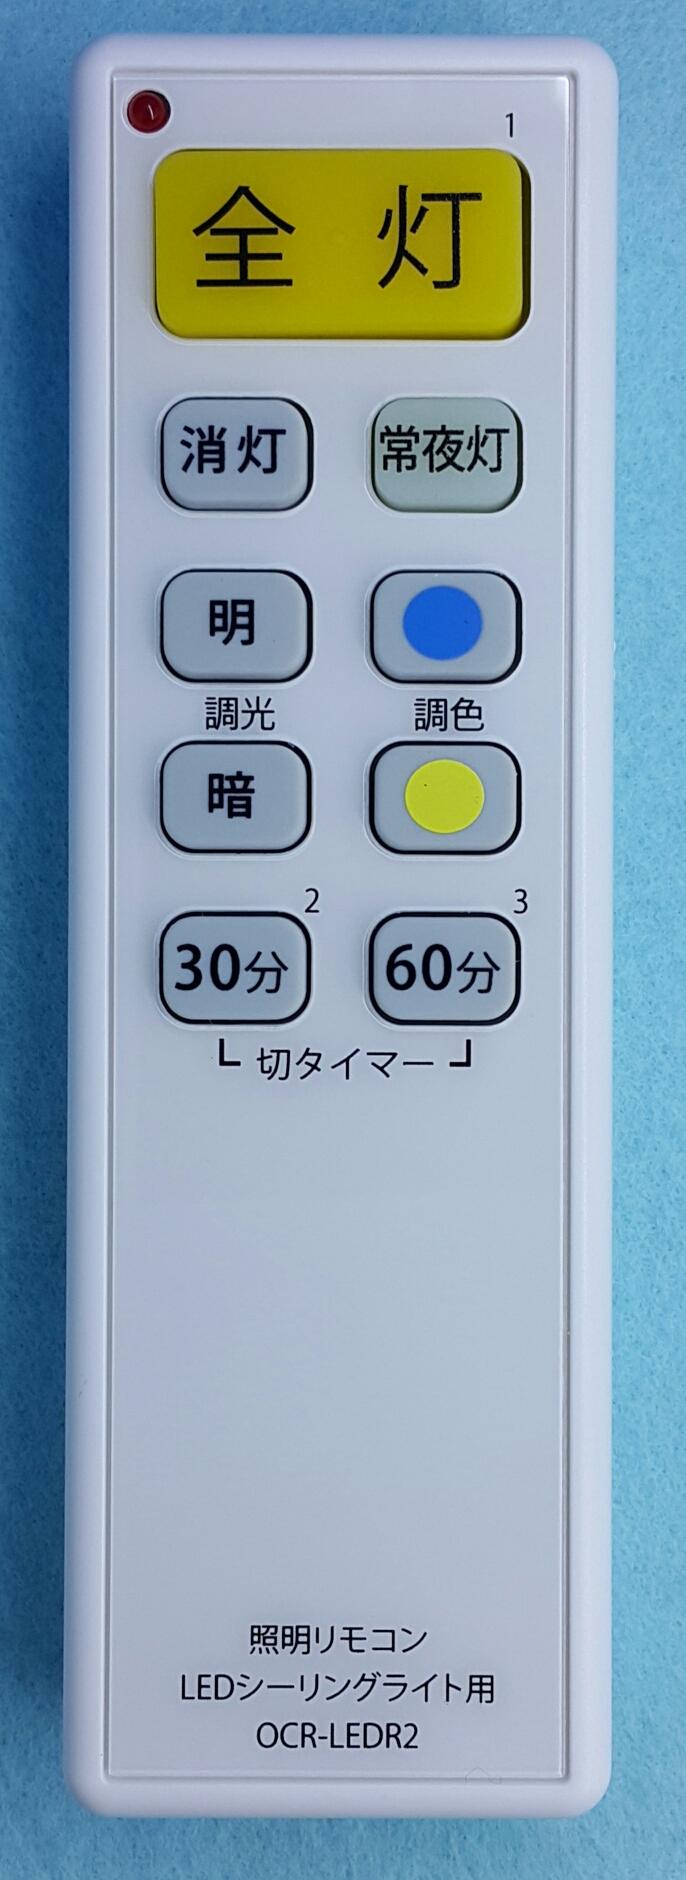 DOSHISHA_OCR-LEDR2_3123_L800B A45B_LAMP_cover.png